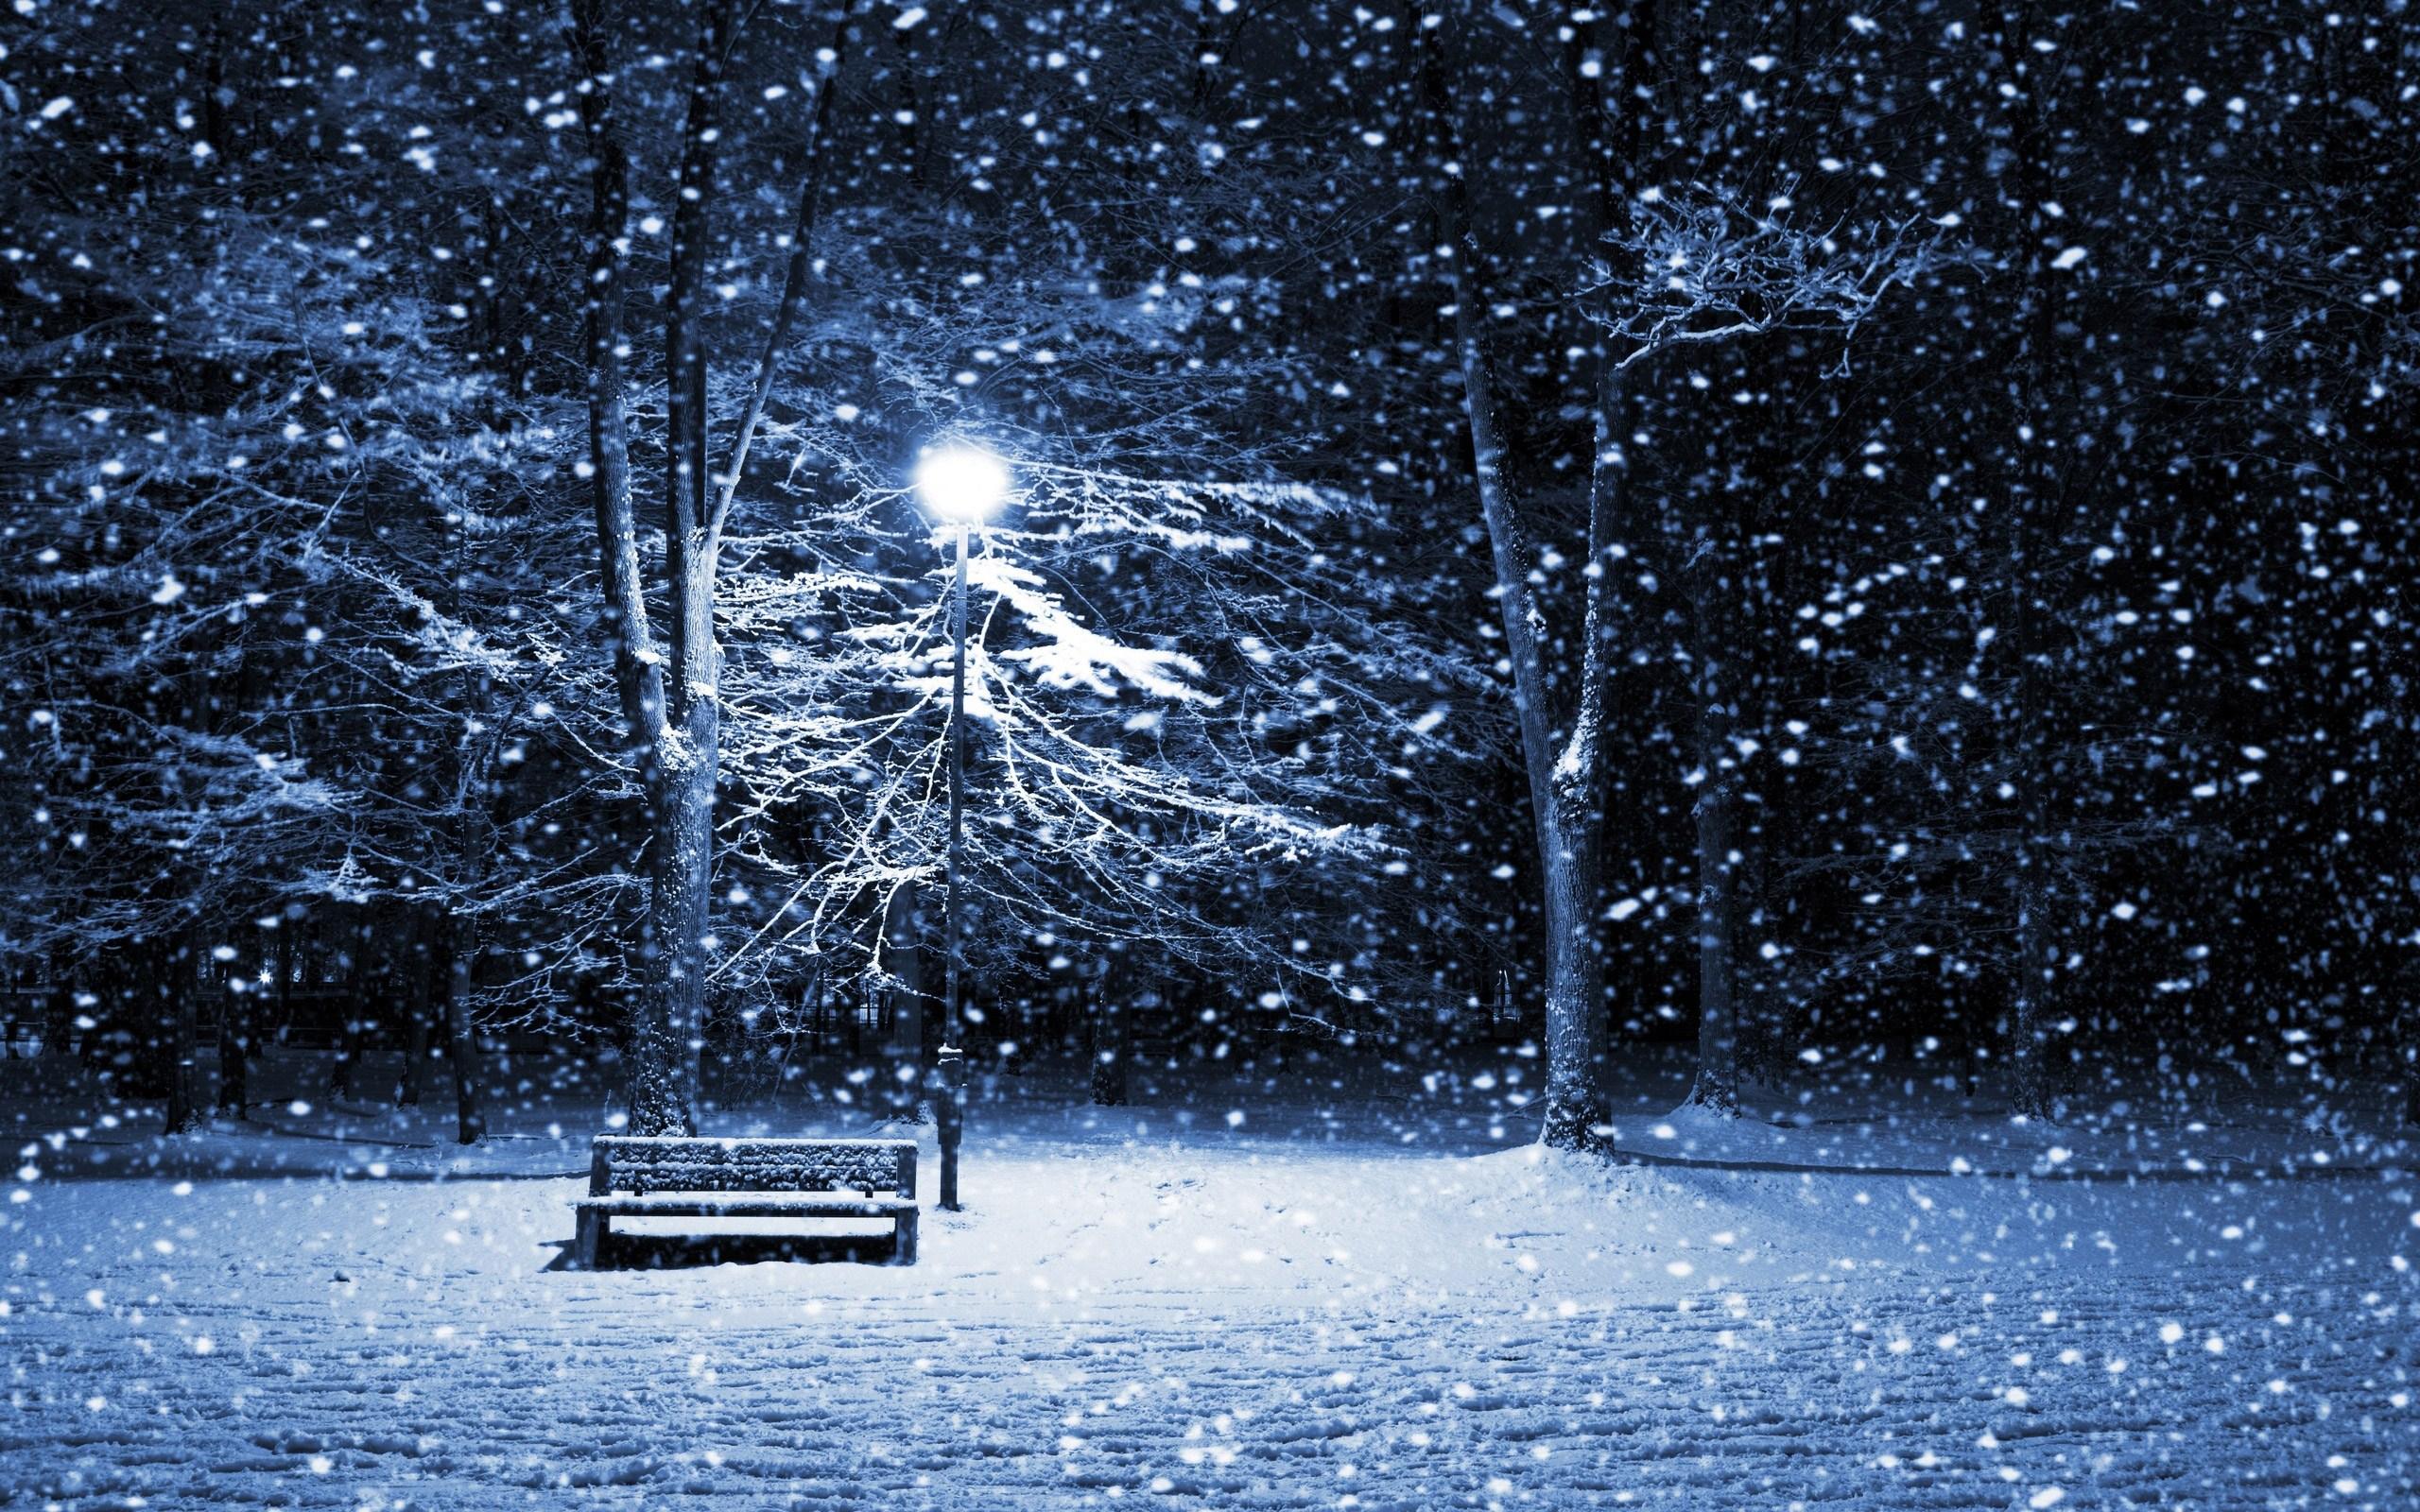 Winter-Scenes-Wallpaper-Free Winter